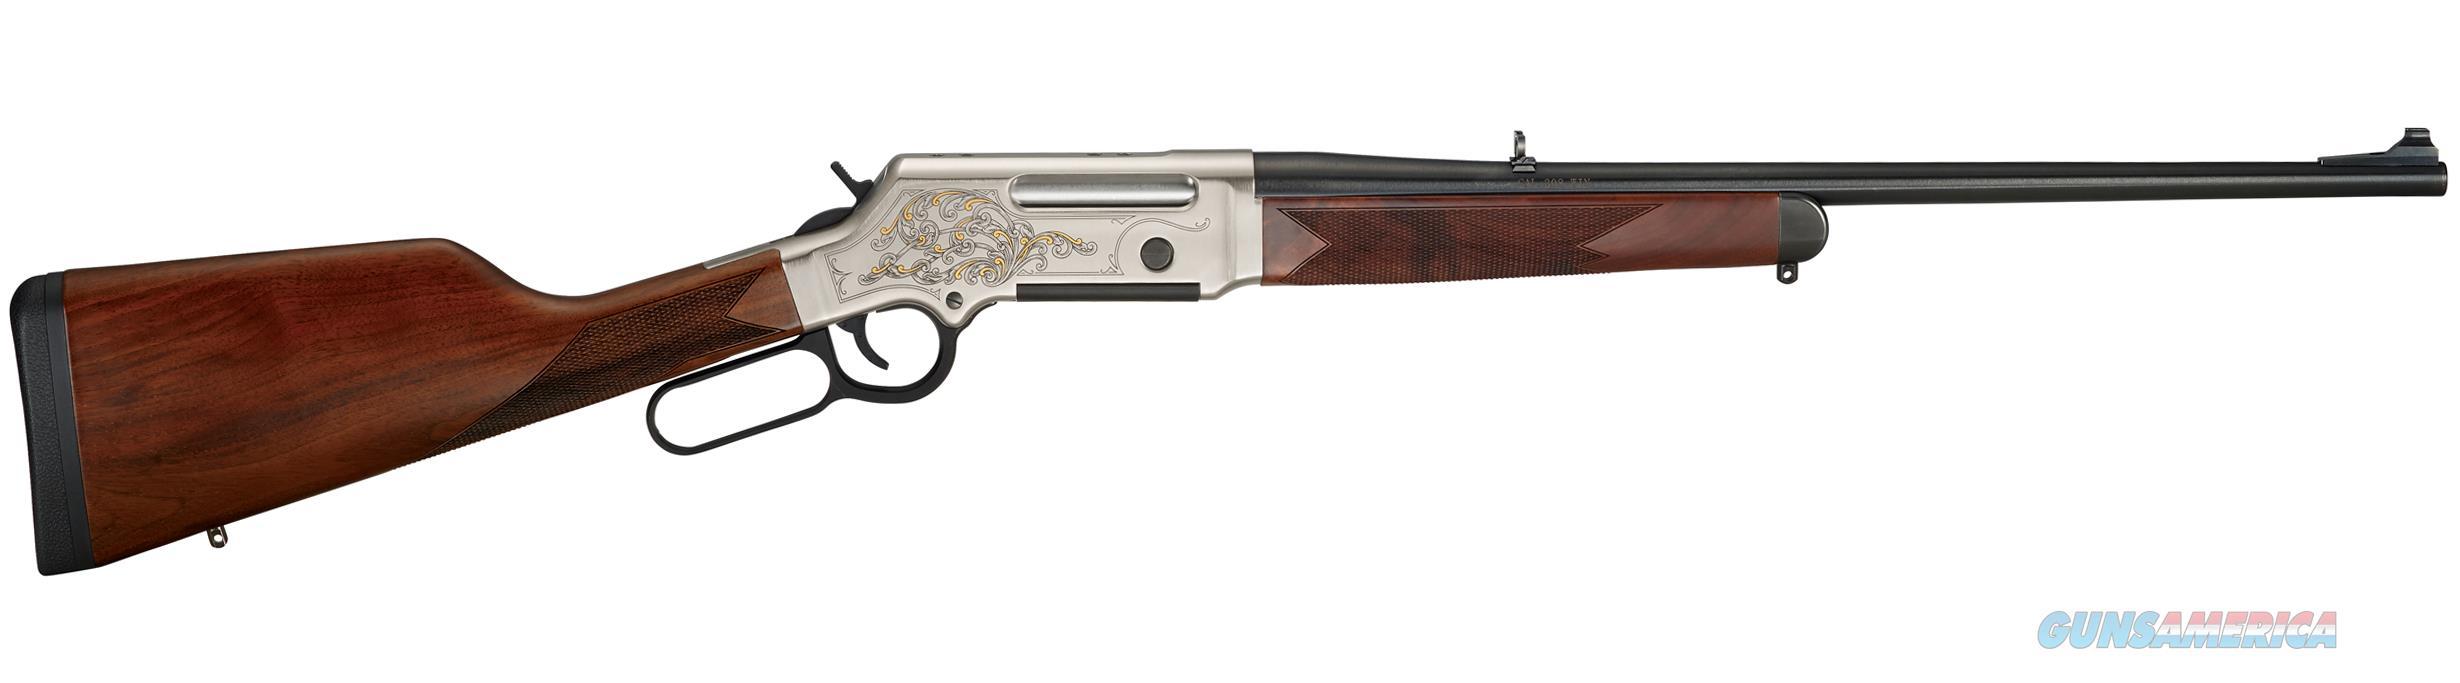 "Henry Long Ranger Deluxe .243 Win 20"" H014D-243   Guns > Rifles > Henry Rifle Company"